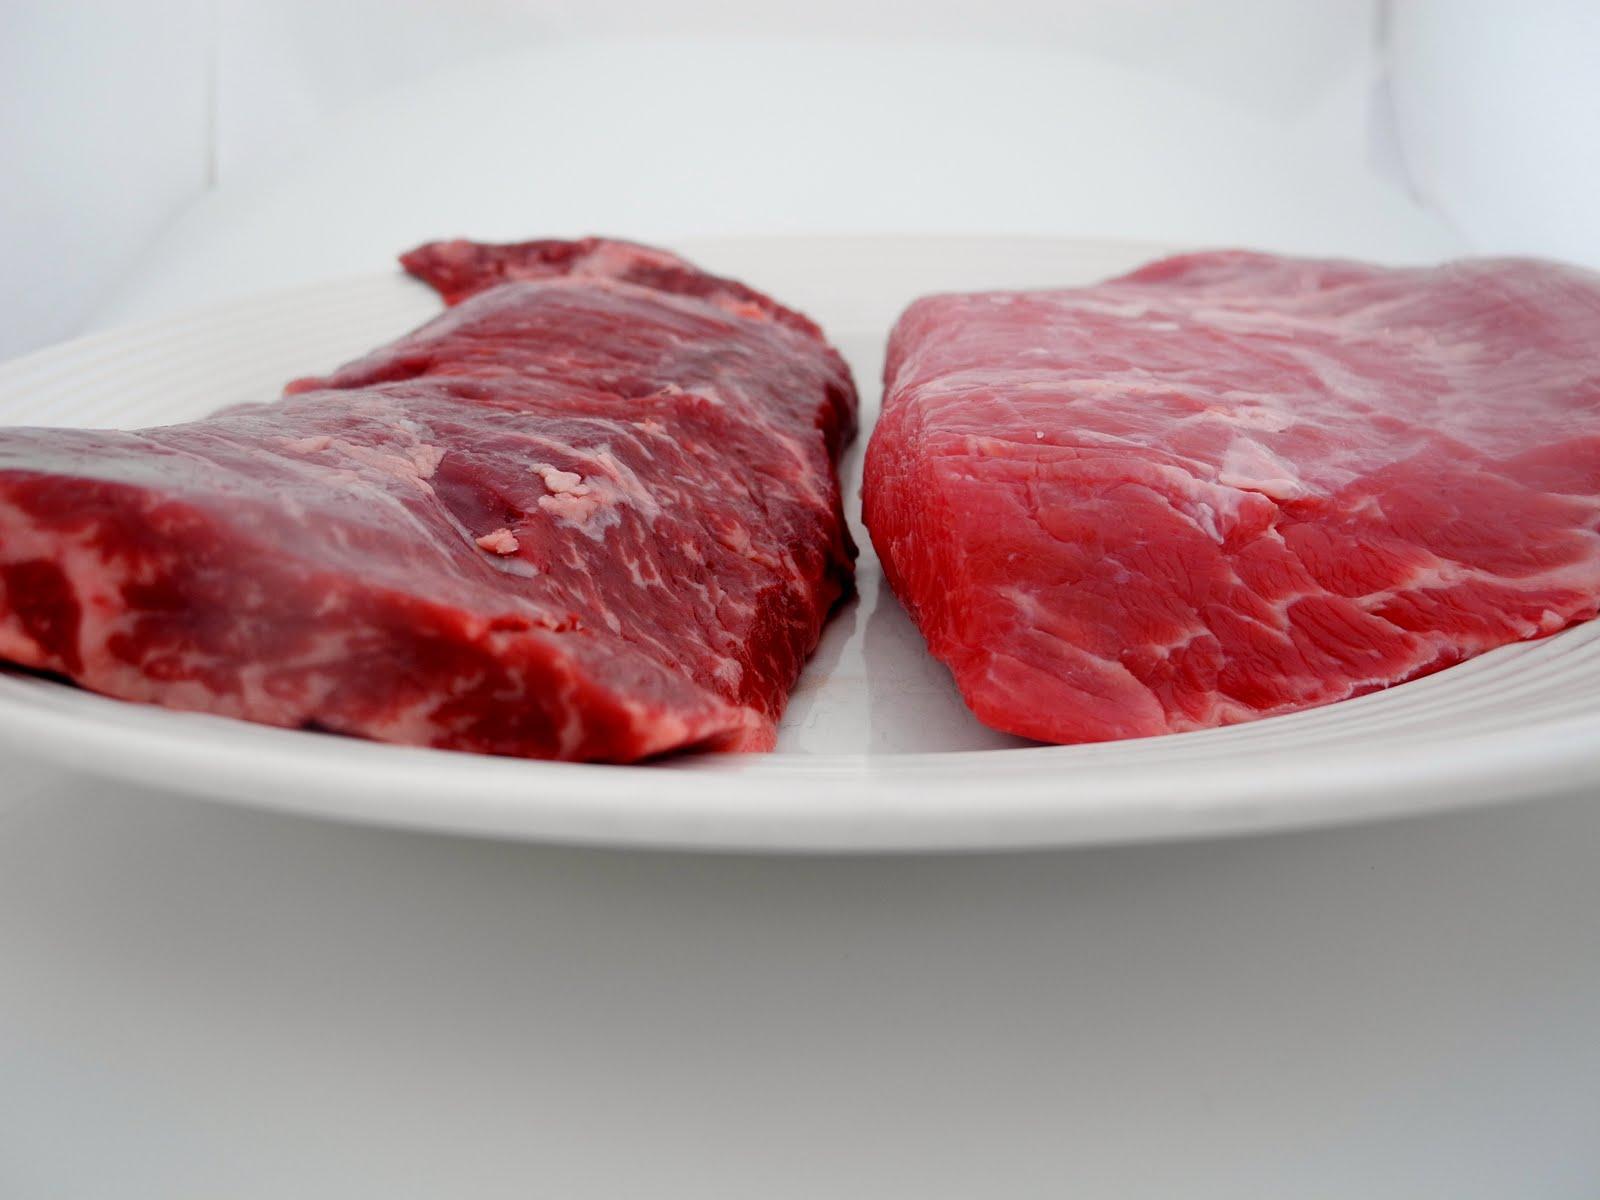 What Is Skirt Steak? - thespruceeats.com